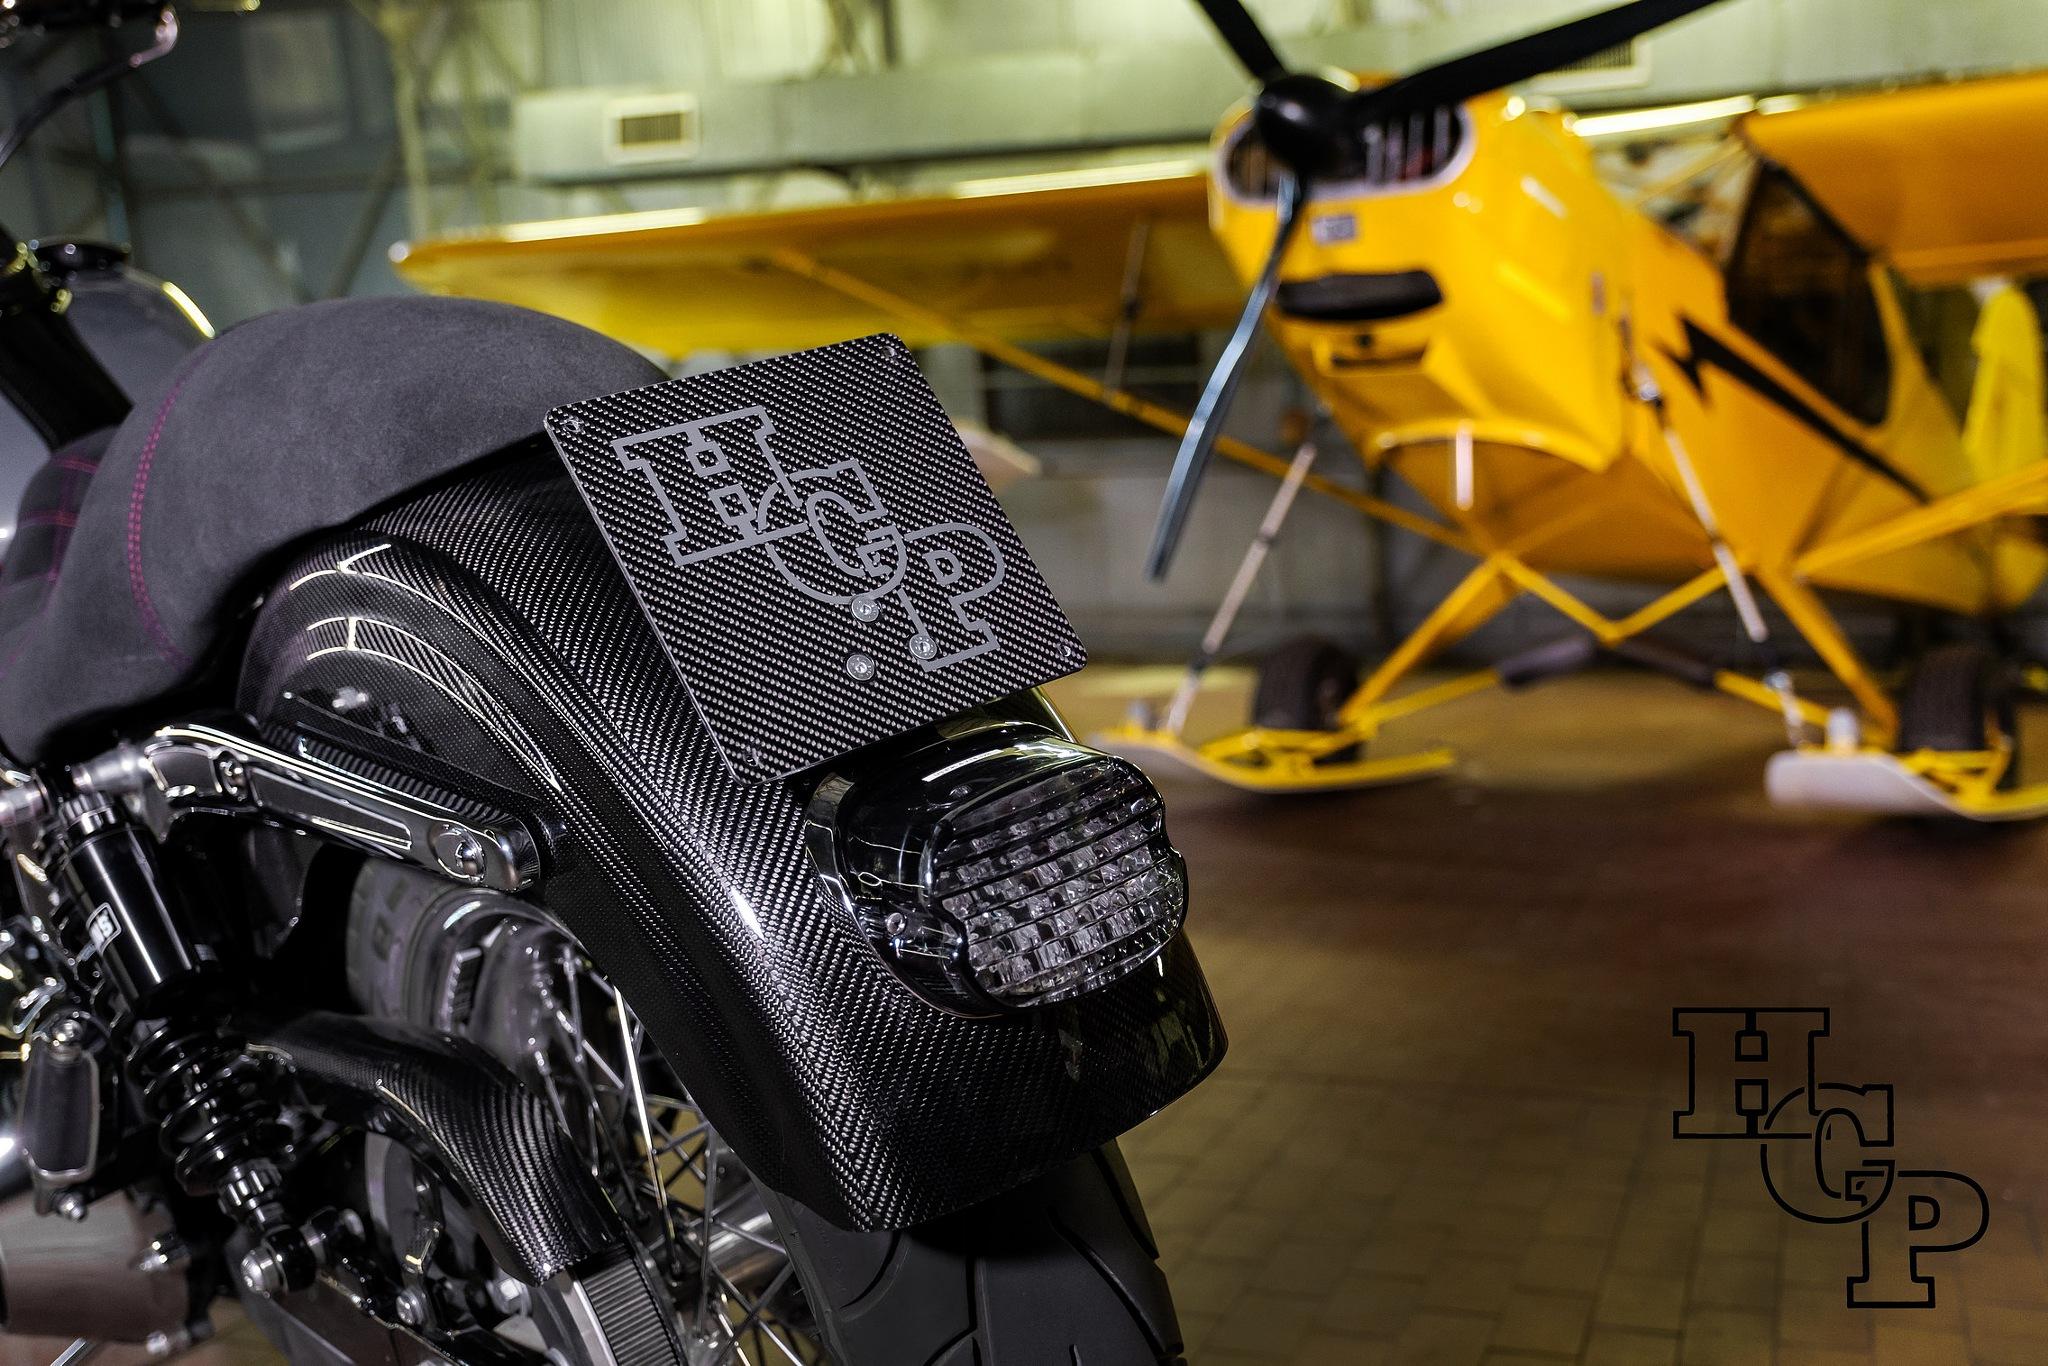 Harley Carbon Parts by Tony_HD